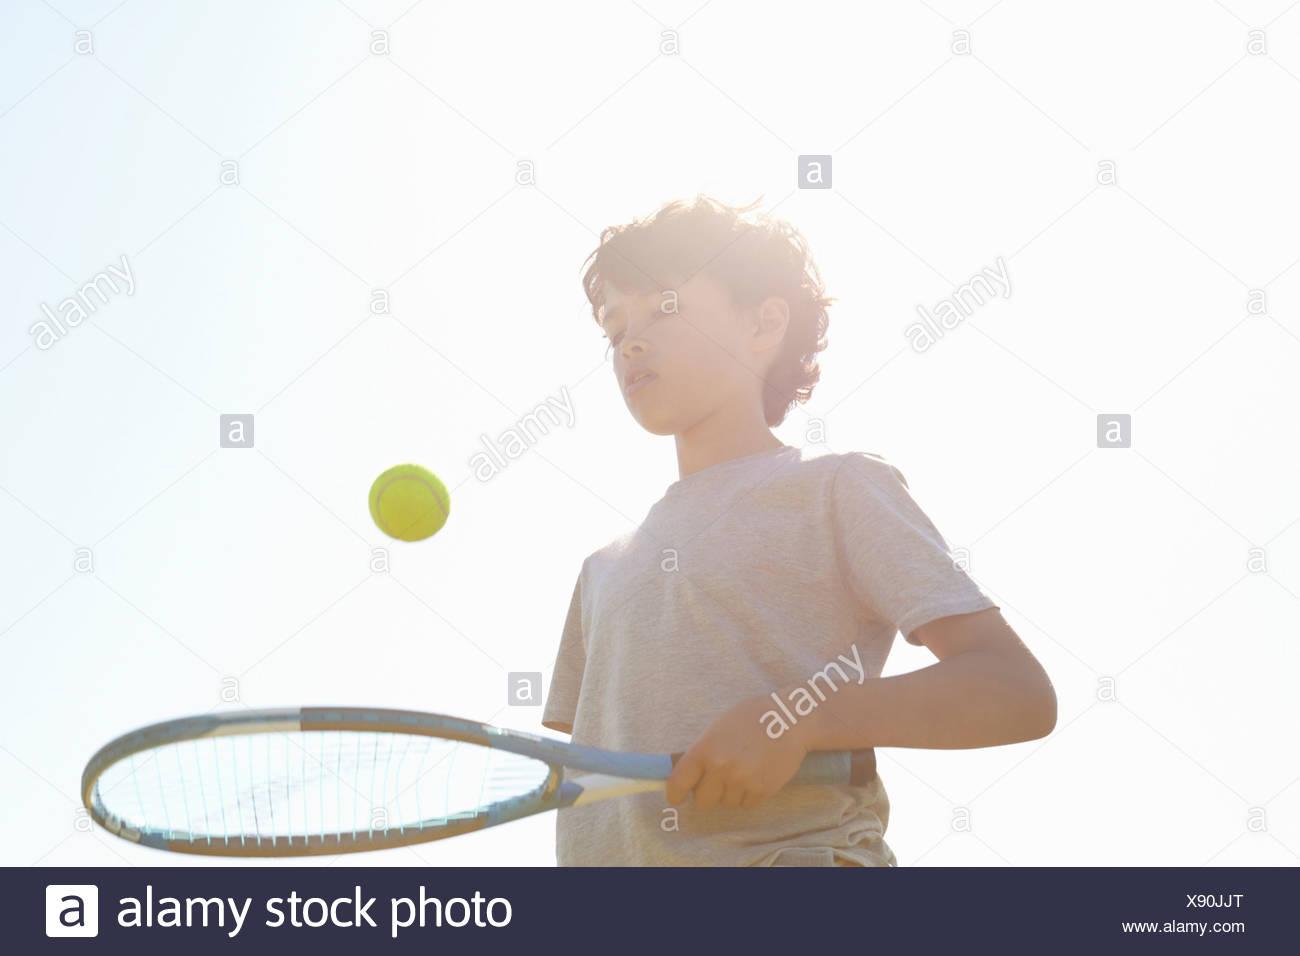 Junge springenden Ball auf Tennisschläger Stockbild